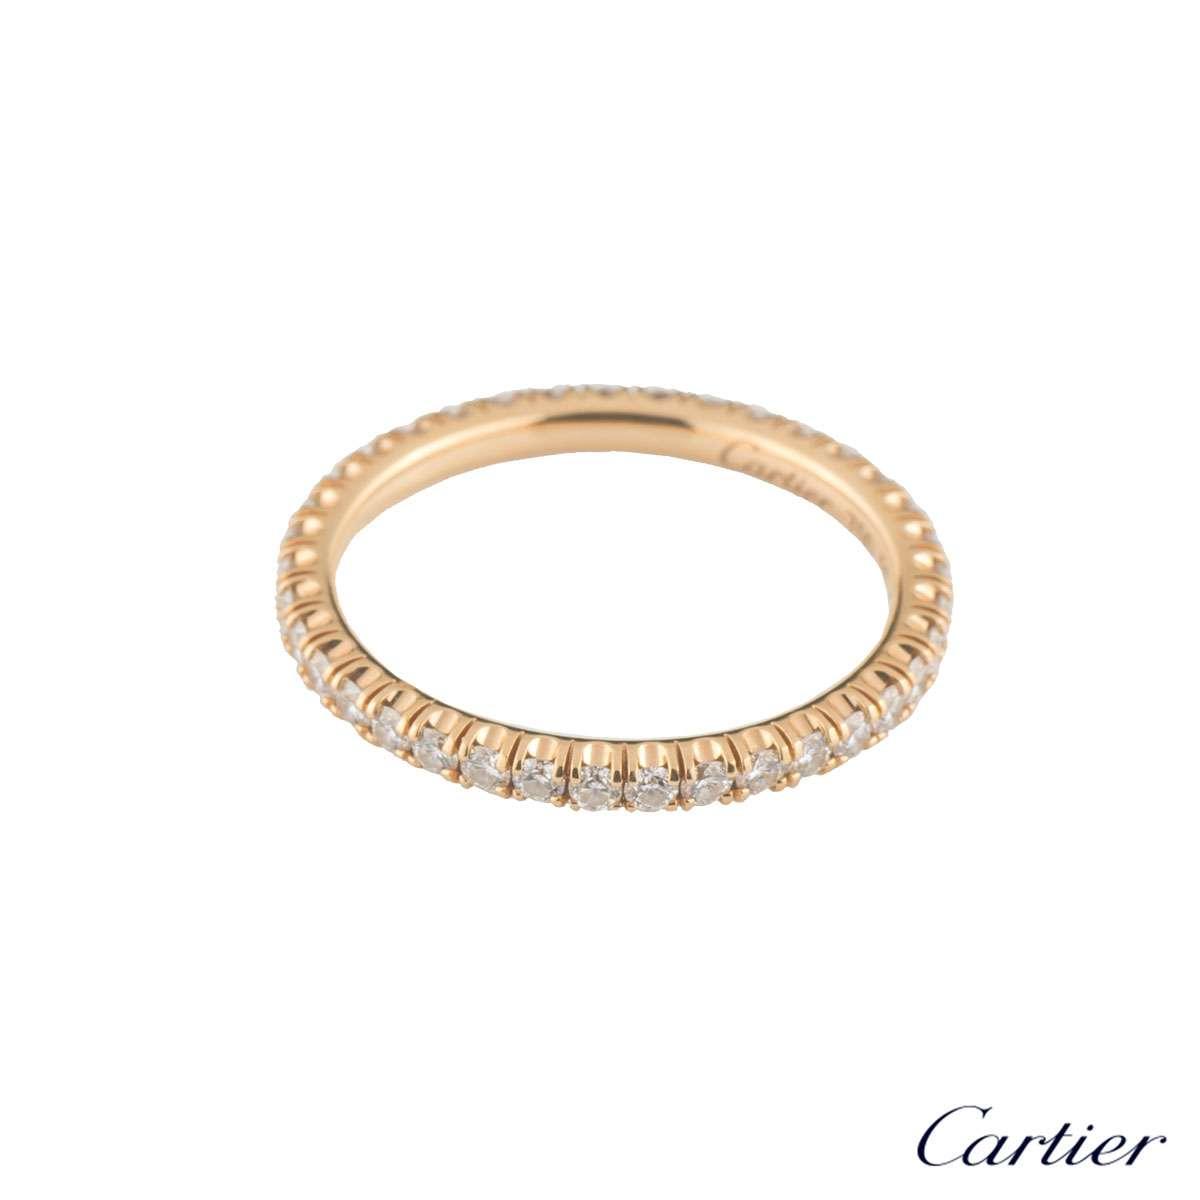 Etincelle Bands: Cartier Rose Gold Diamond Etincelle Ring B4086550